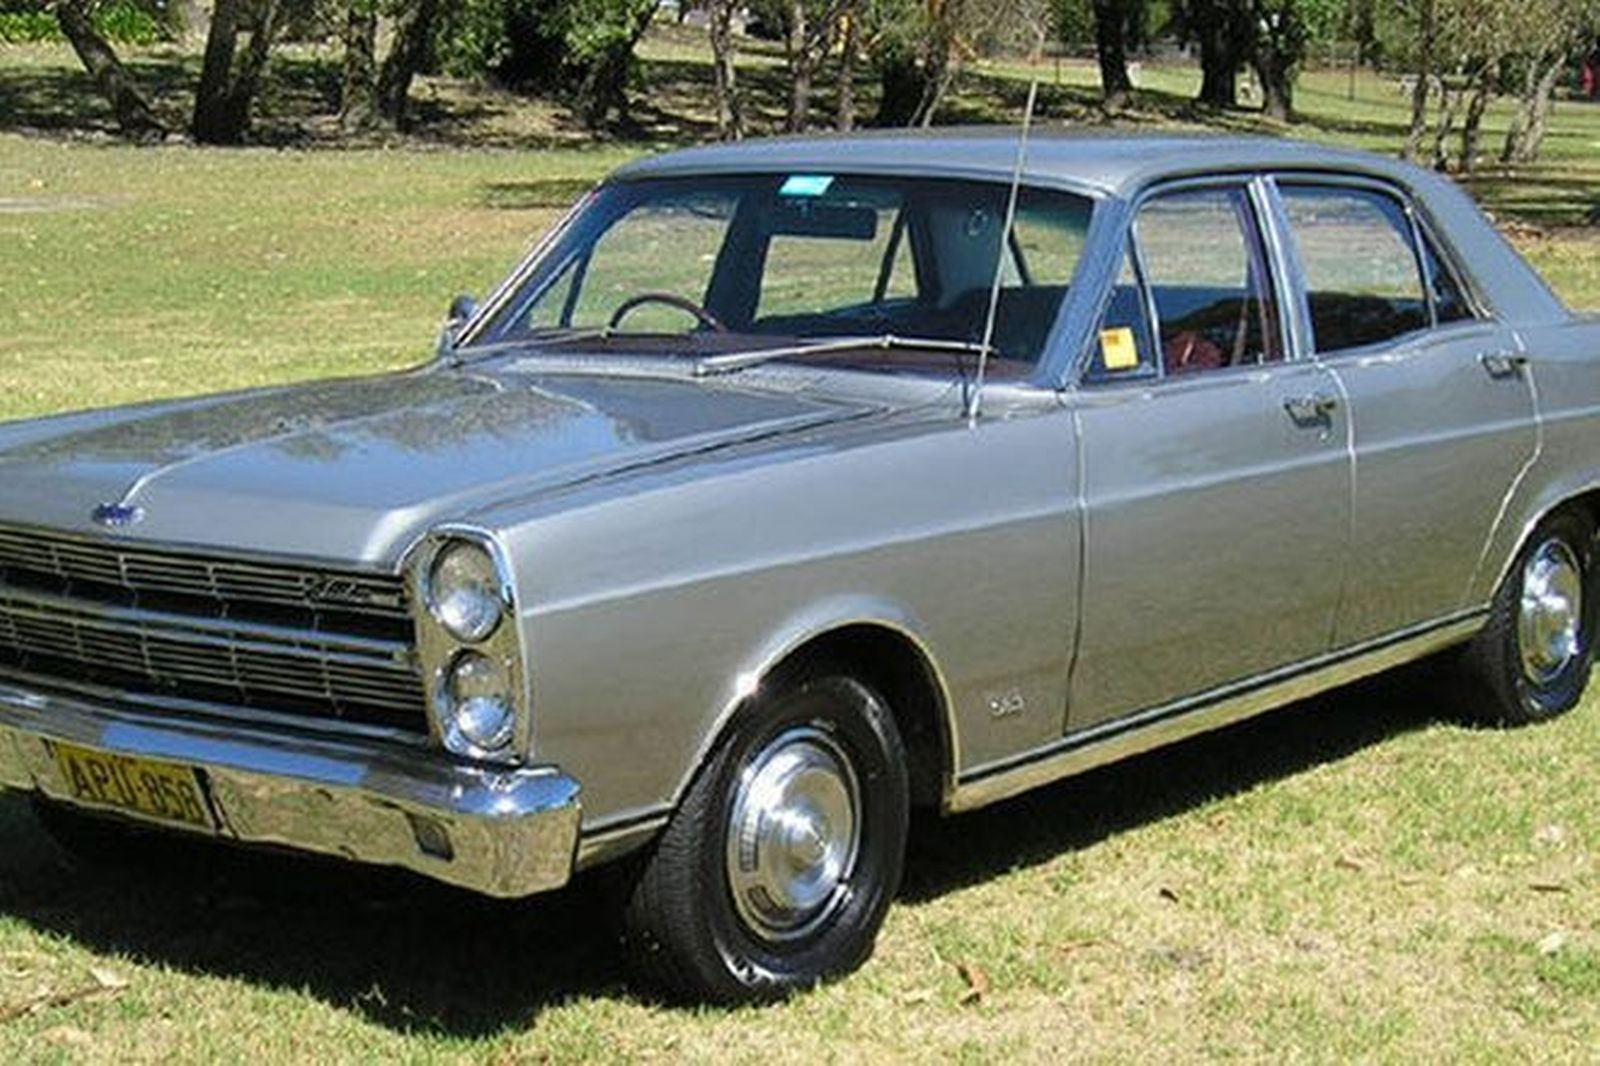 Ford Fairlane Zc V Sedan